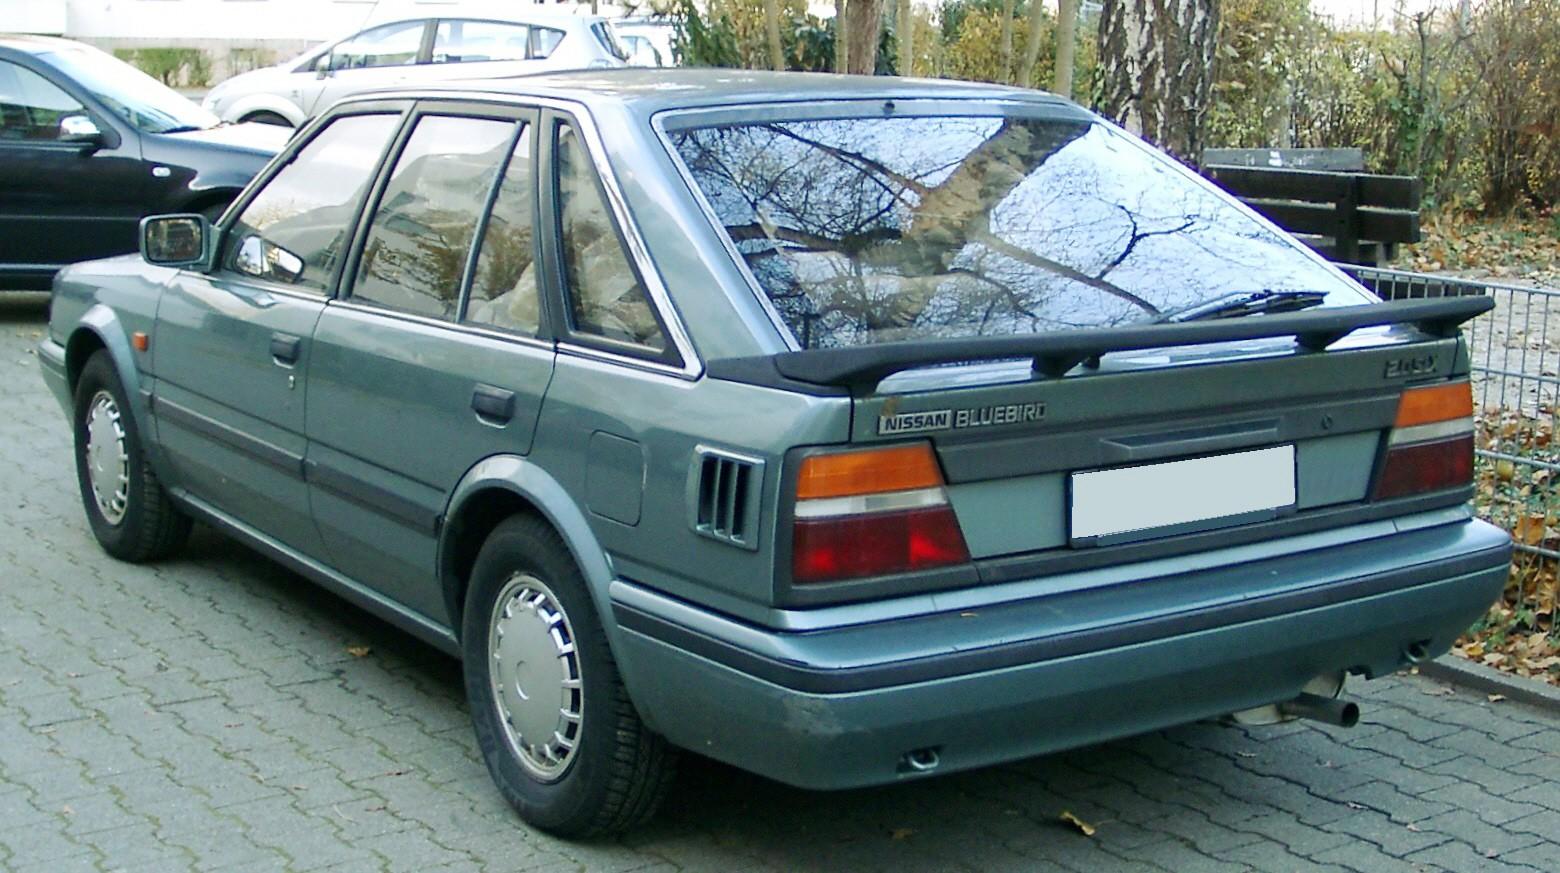 1990 Nissan Bluebird Sedan Partsopen